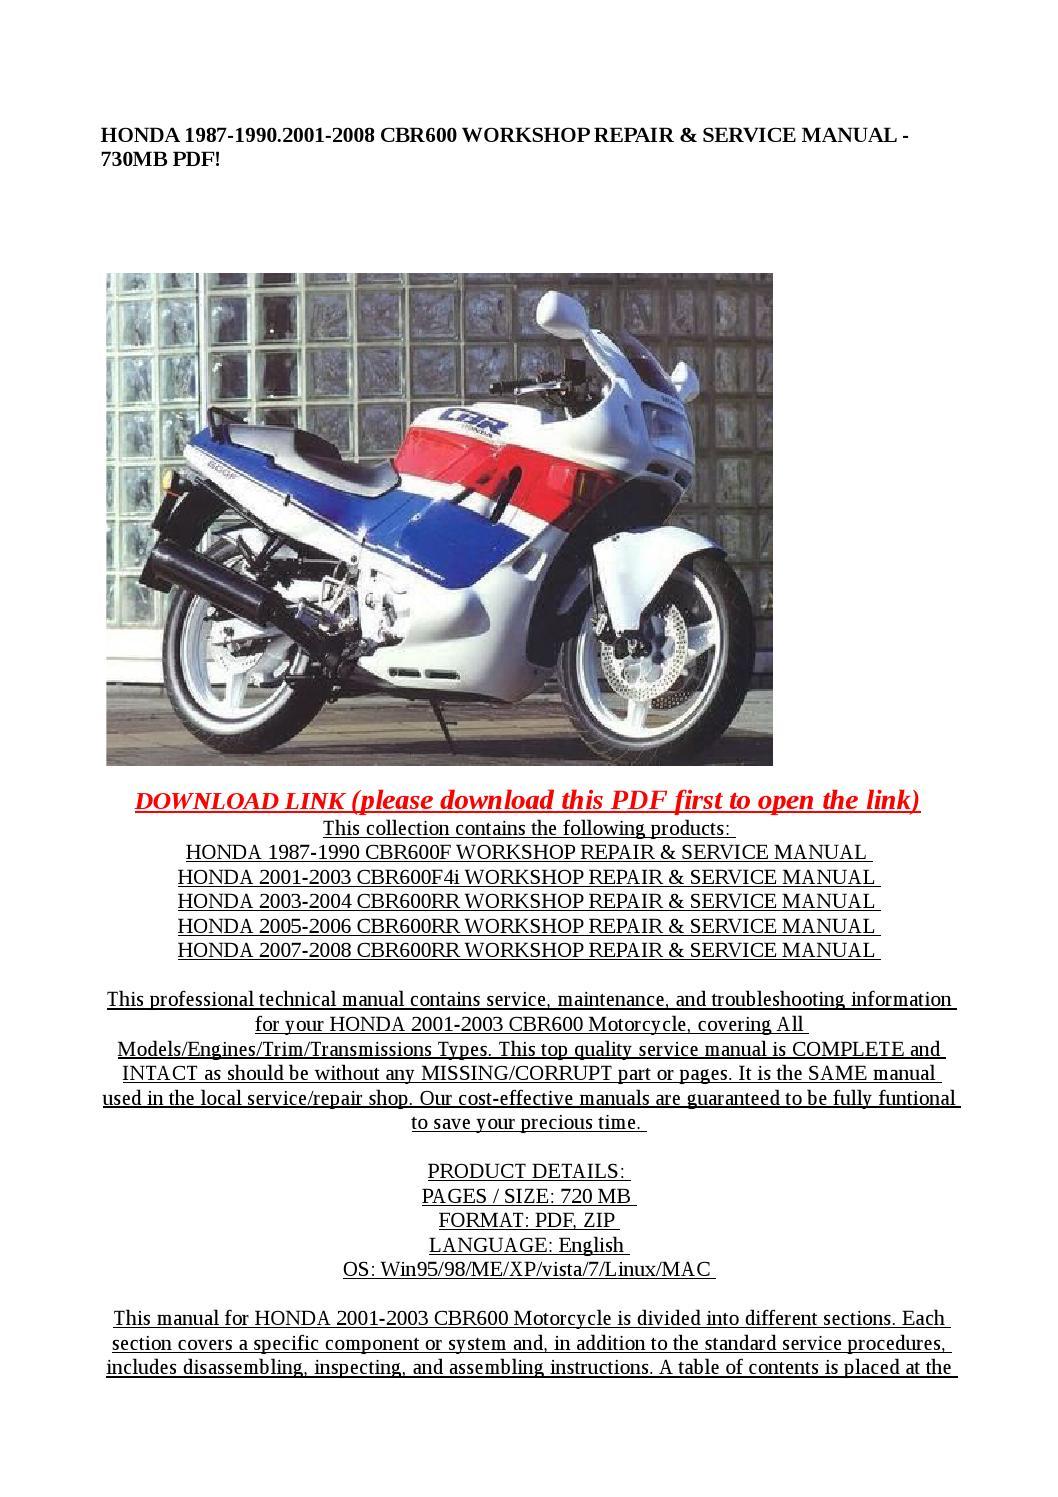 2004 honda cbr600rr service manual pdf